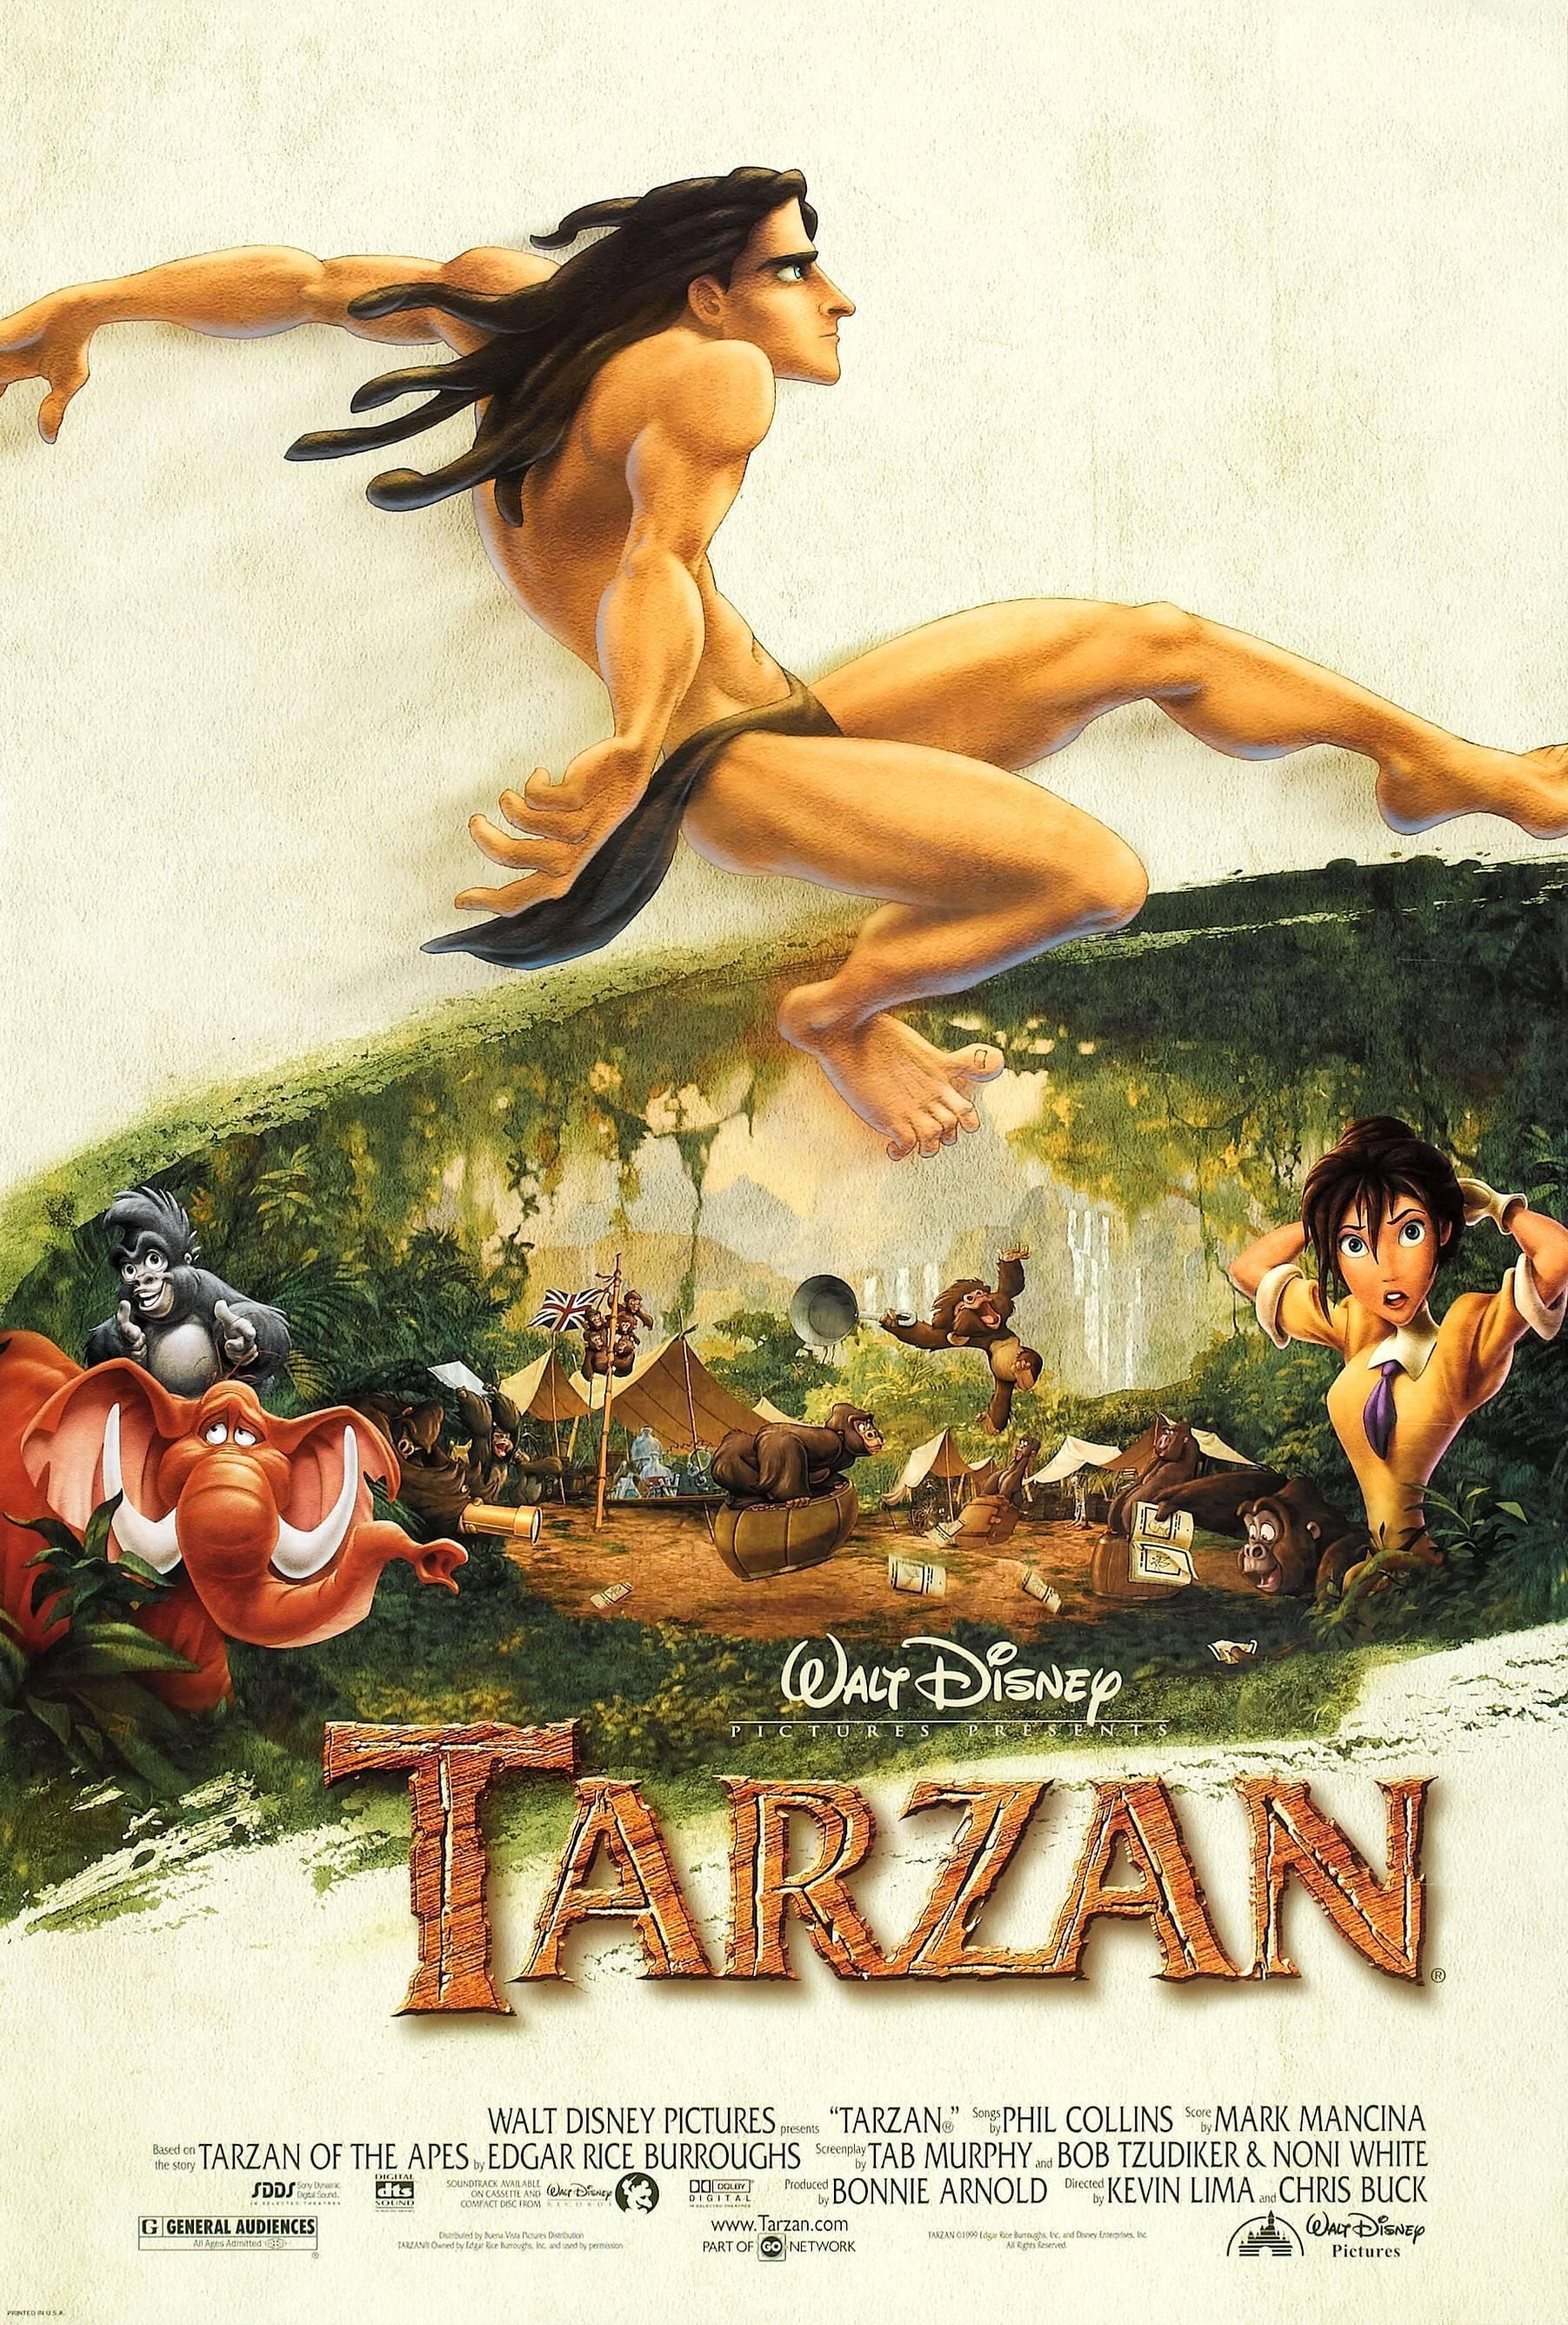 bd54a1ed7c7ce1300914_49ae49b189d590b59a63_Tarzan_Second_Poster.jpg